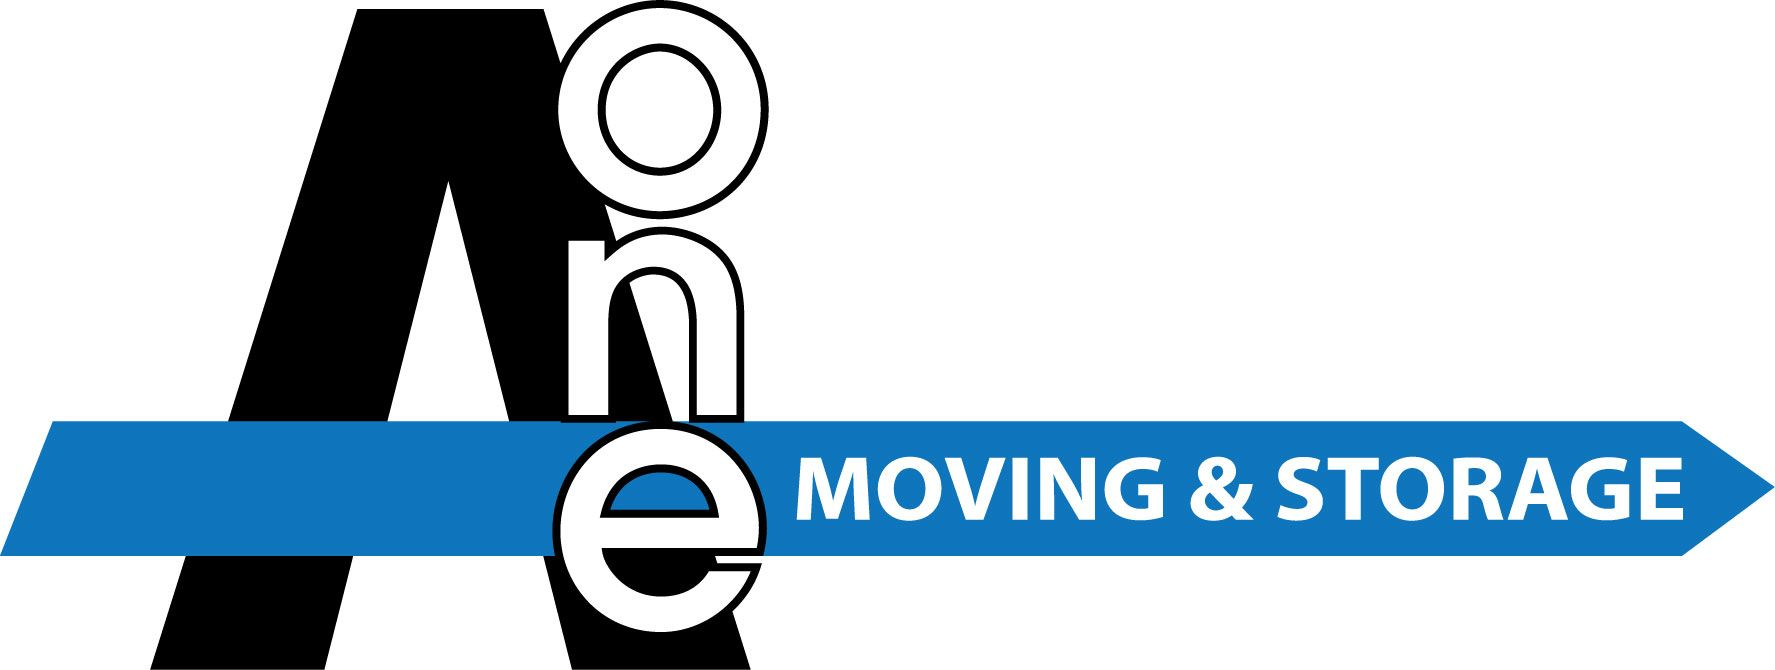 Severna Park Moving Company Offers Alternative To Self Storage